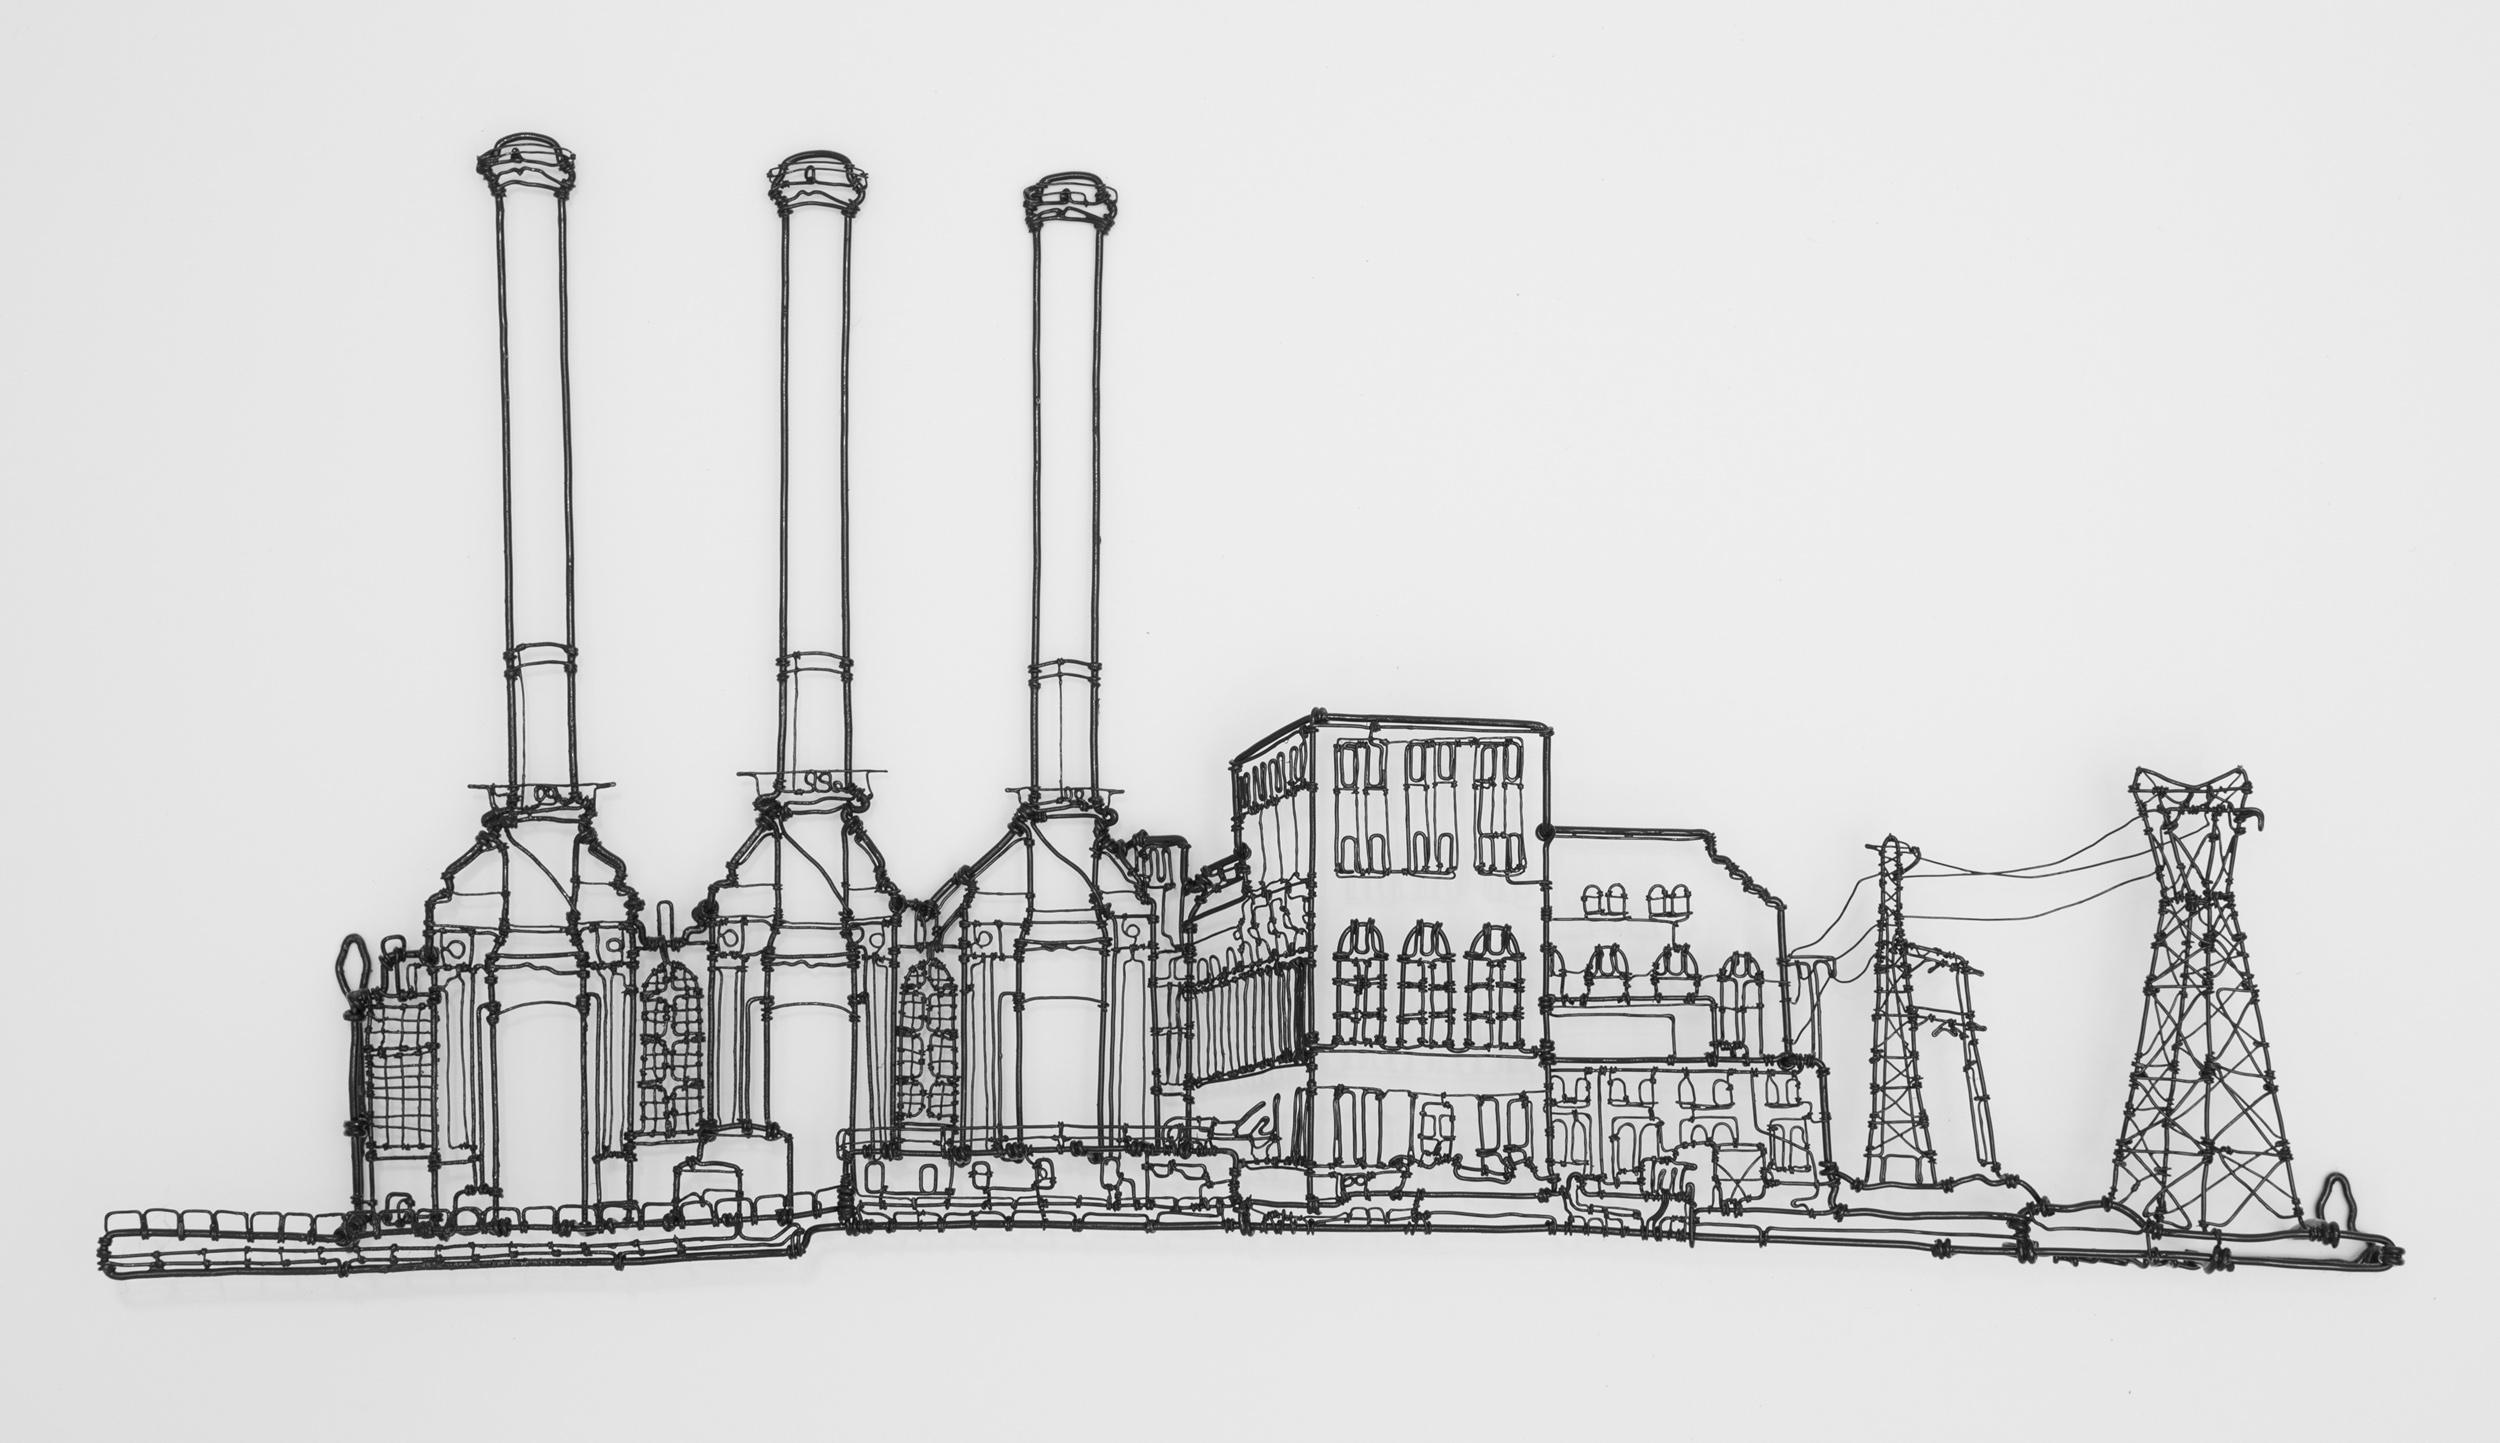 Providence Power plant